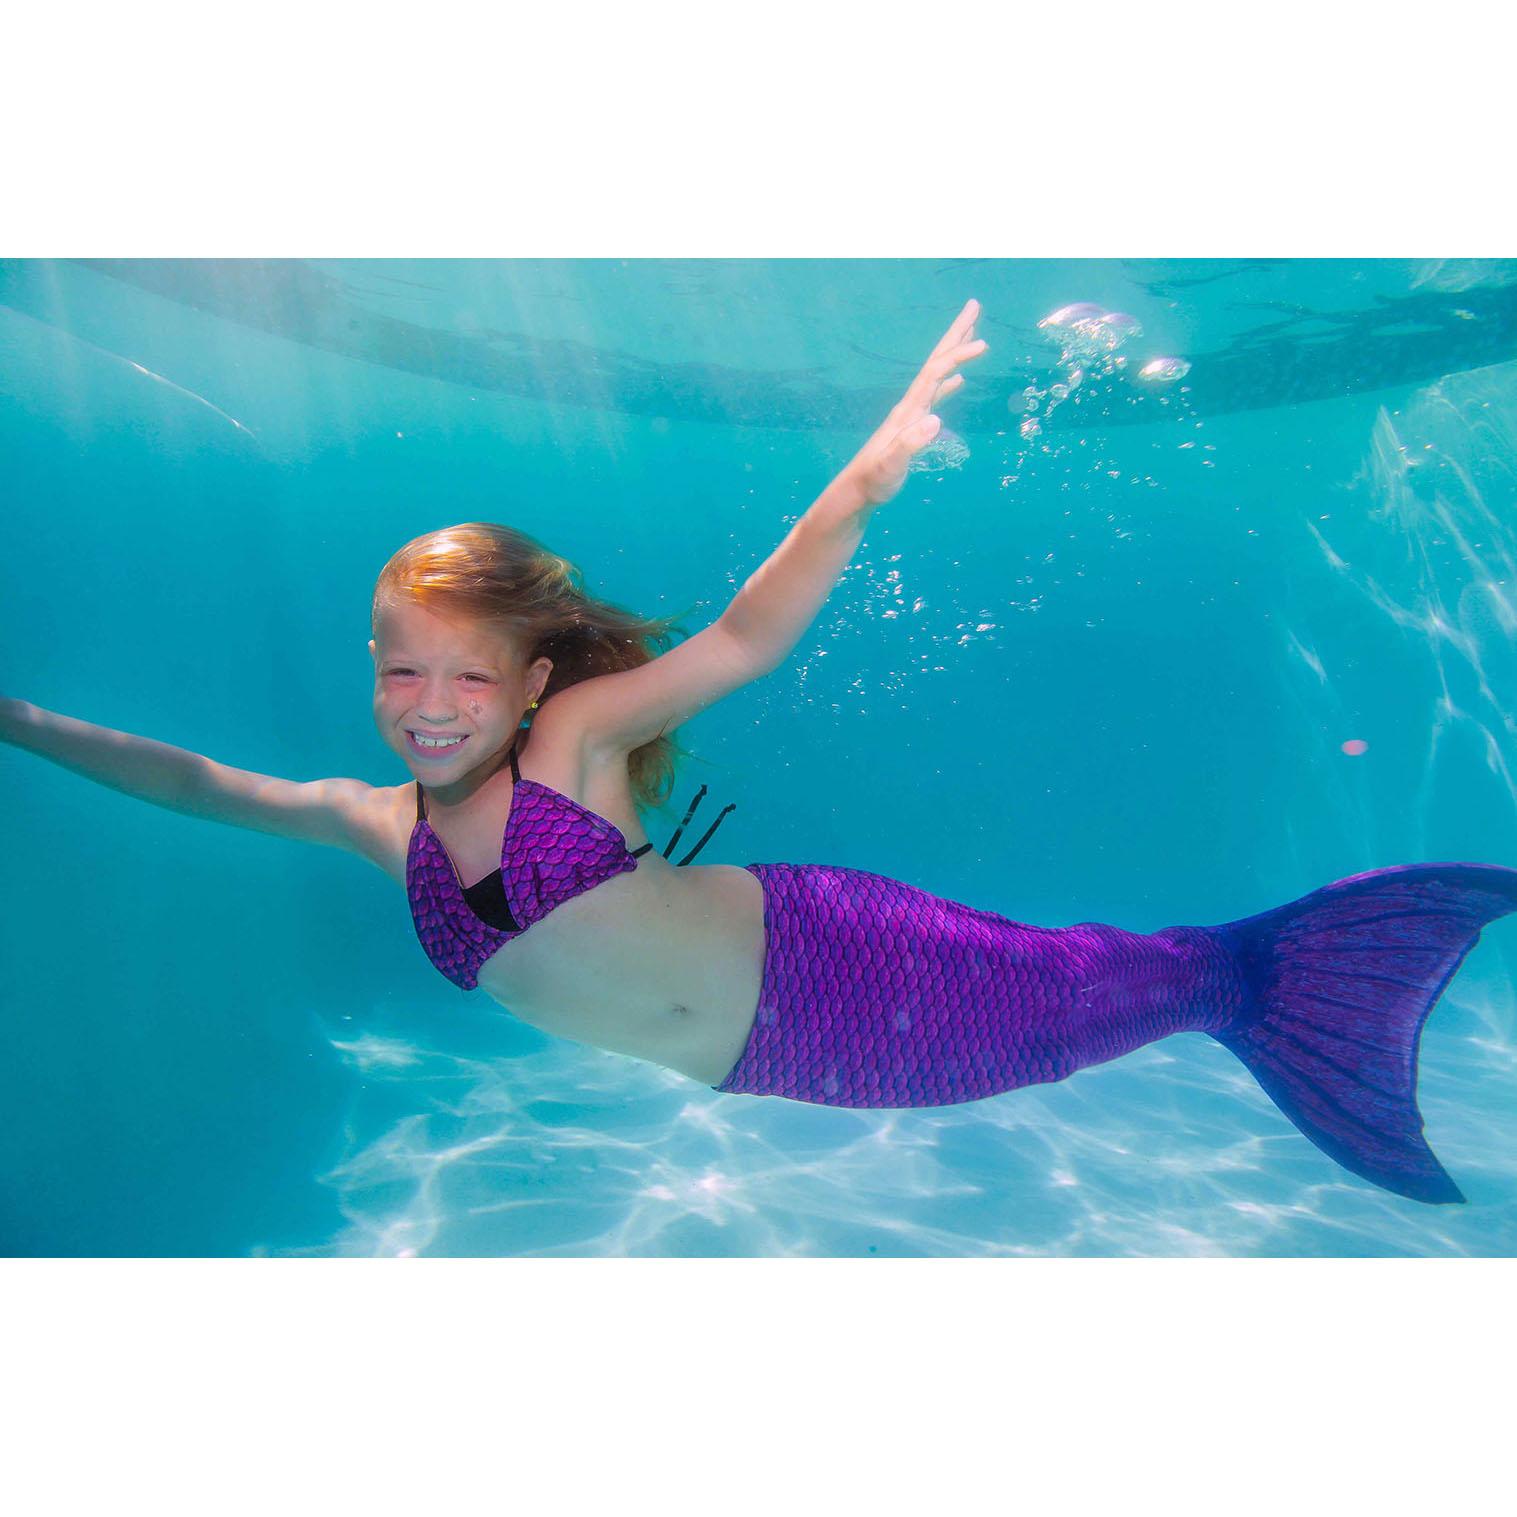 Kid Size Mermaid Tails for Swimming, Swimmable- Fin Fun ...  Kid Size Mermai...